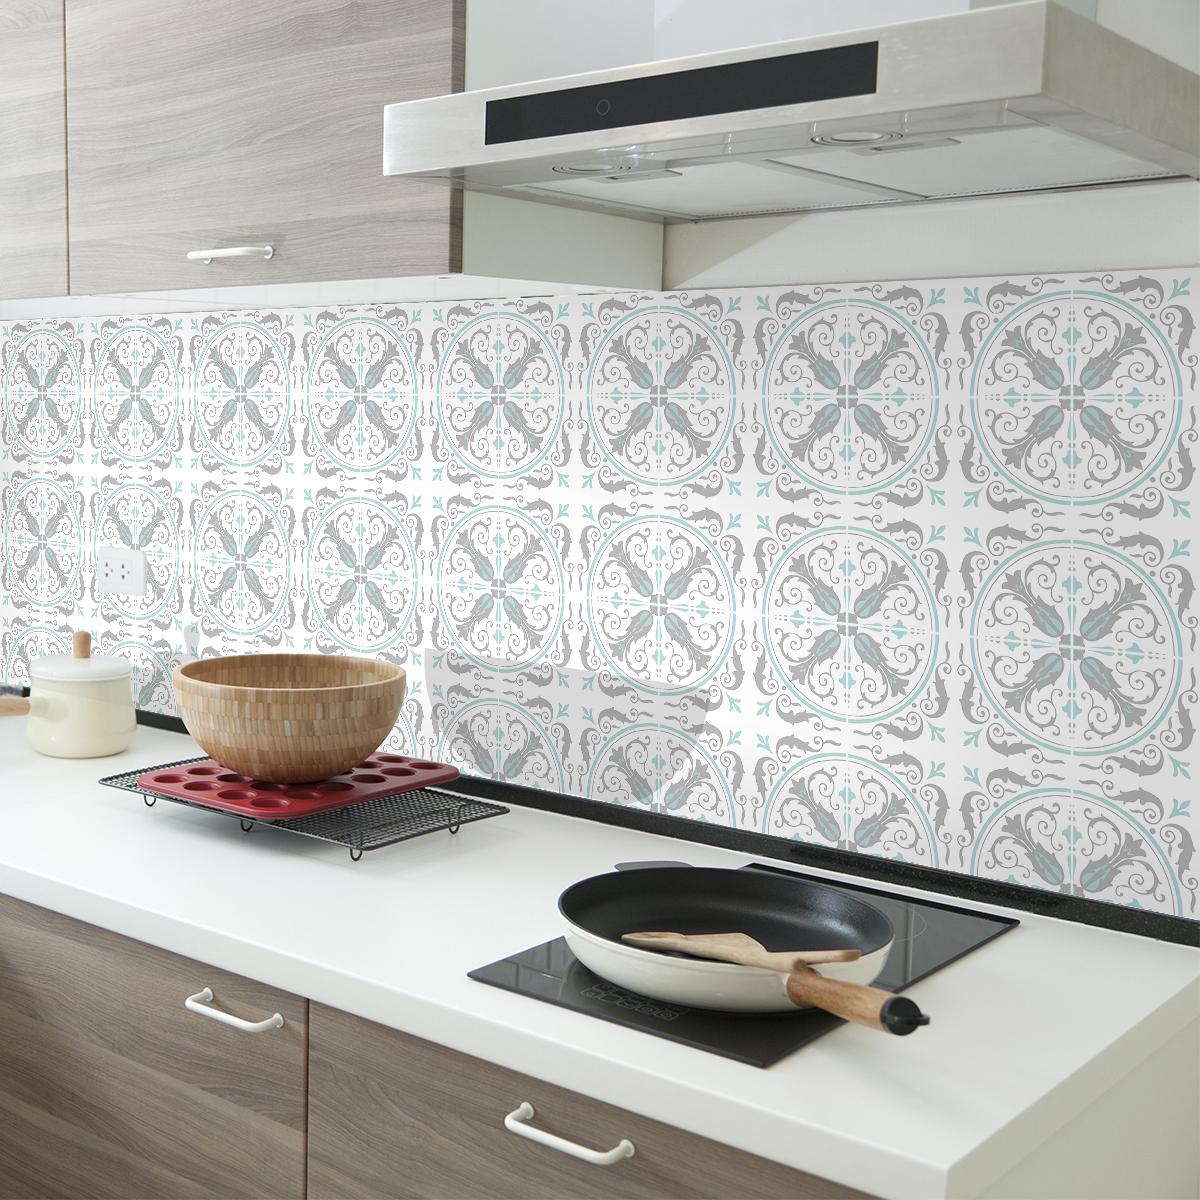 60 stickers carreaux de ciment azulejos amanda cuisine. Black Bedroom Furniture Sets. Home Design Ideas